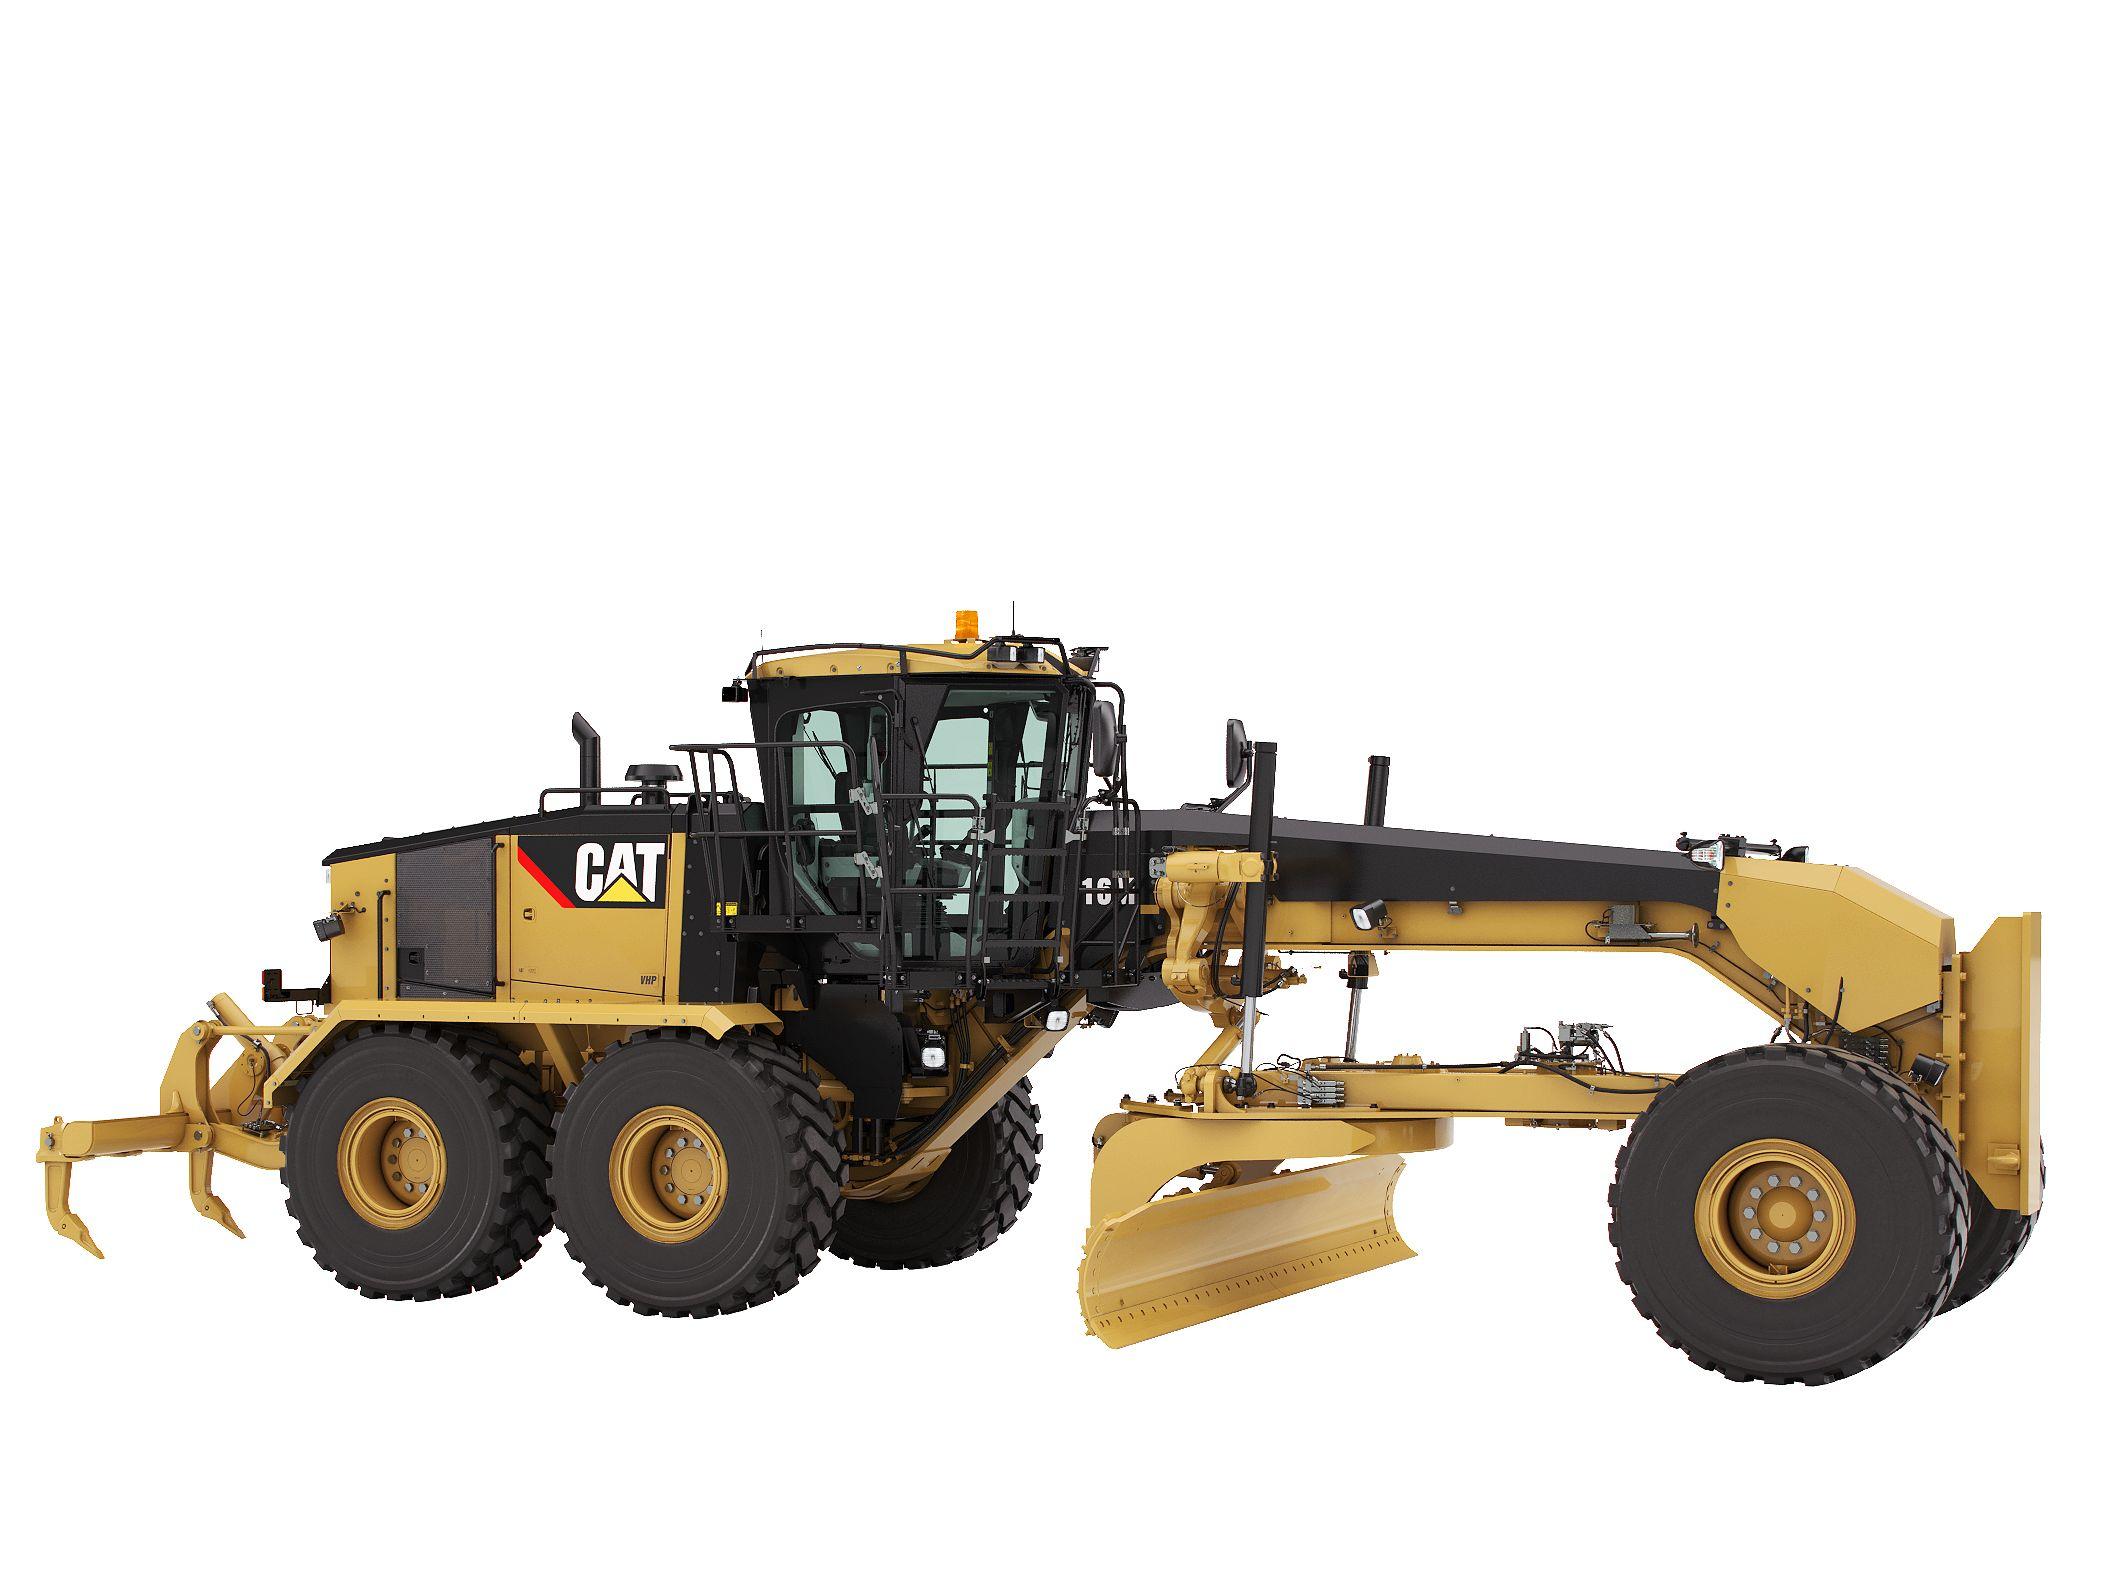 Cat 14m Motor Grader 13972381 Non Current For Sale